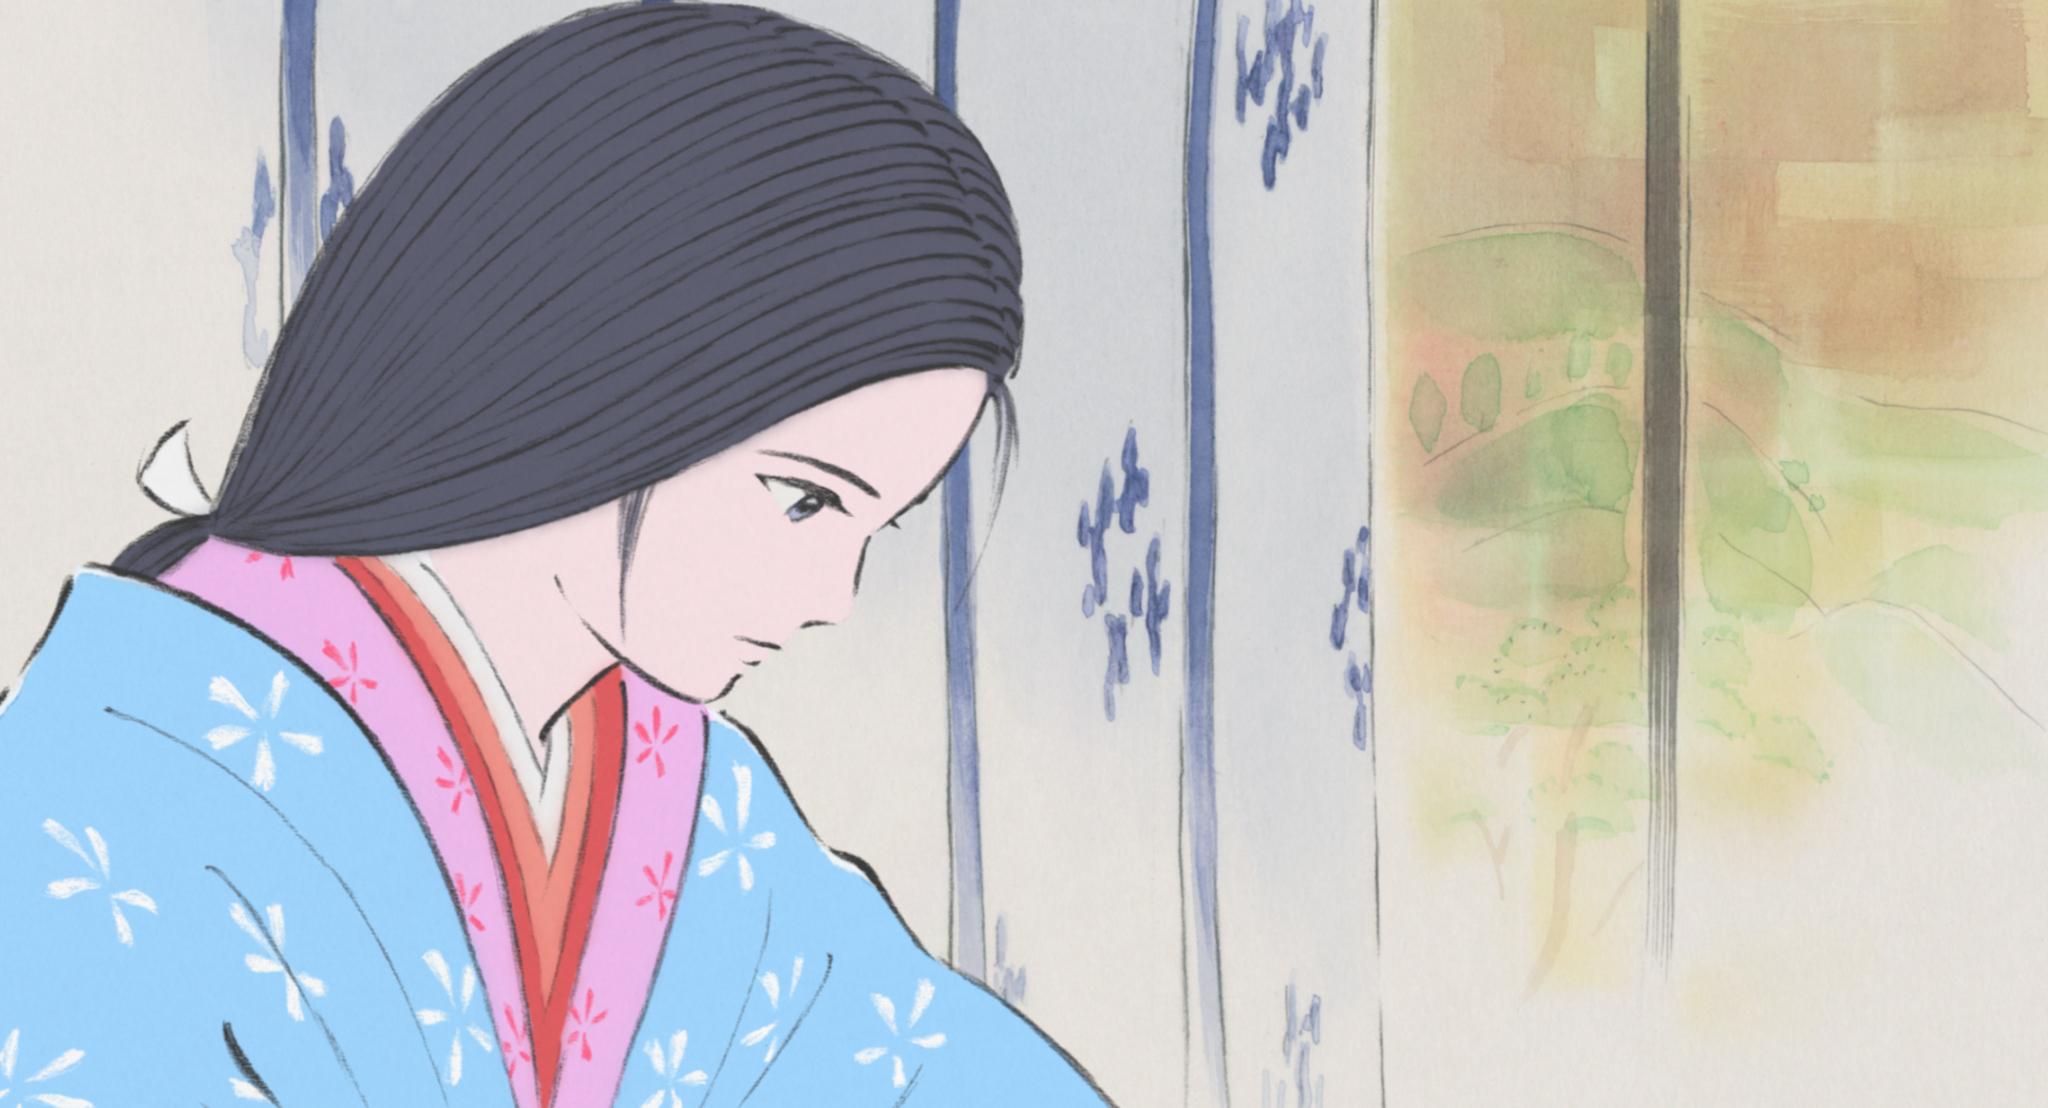 The Tale of the Princess Kaguya – 2017